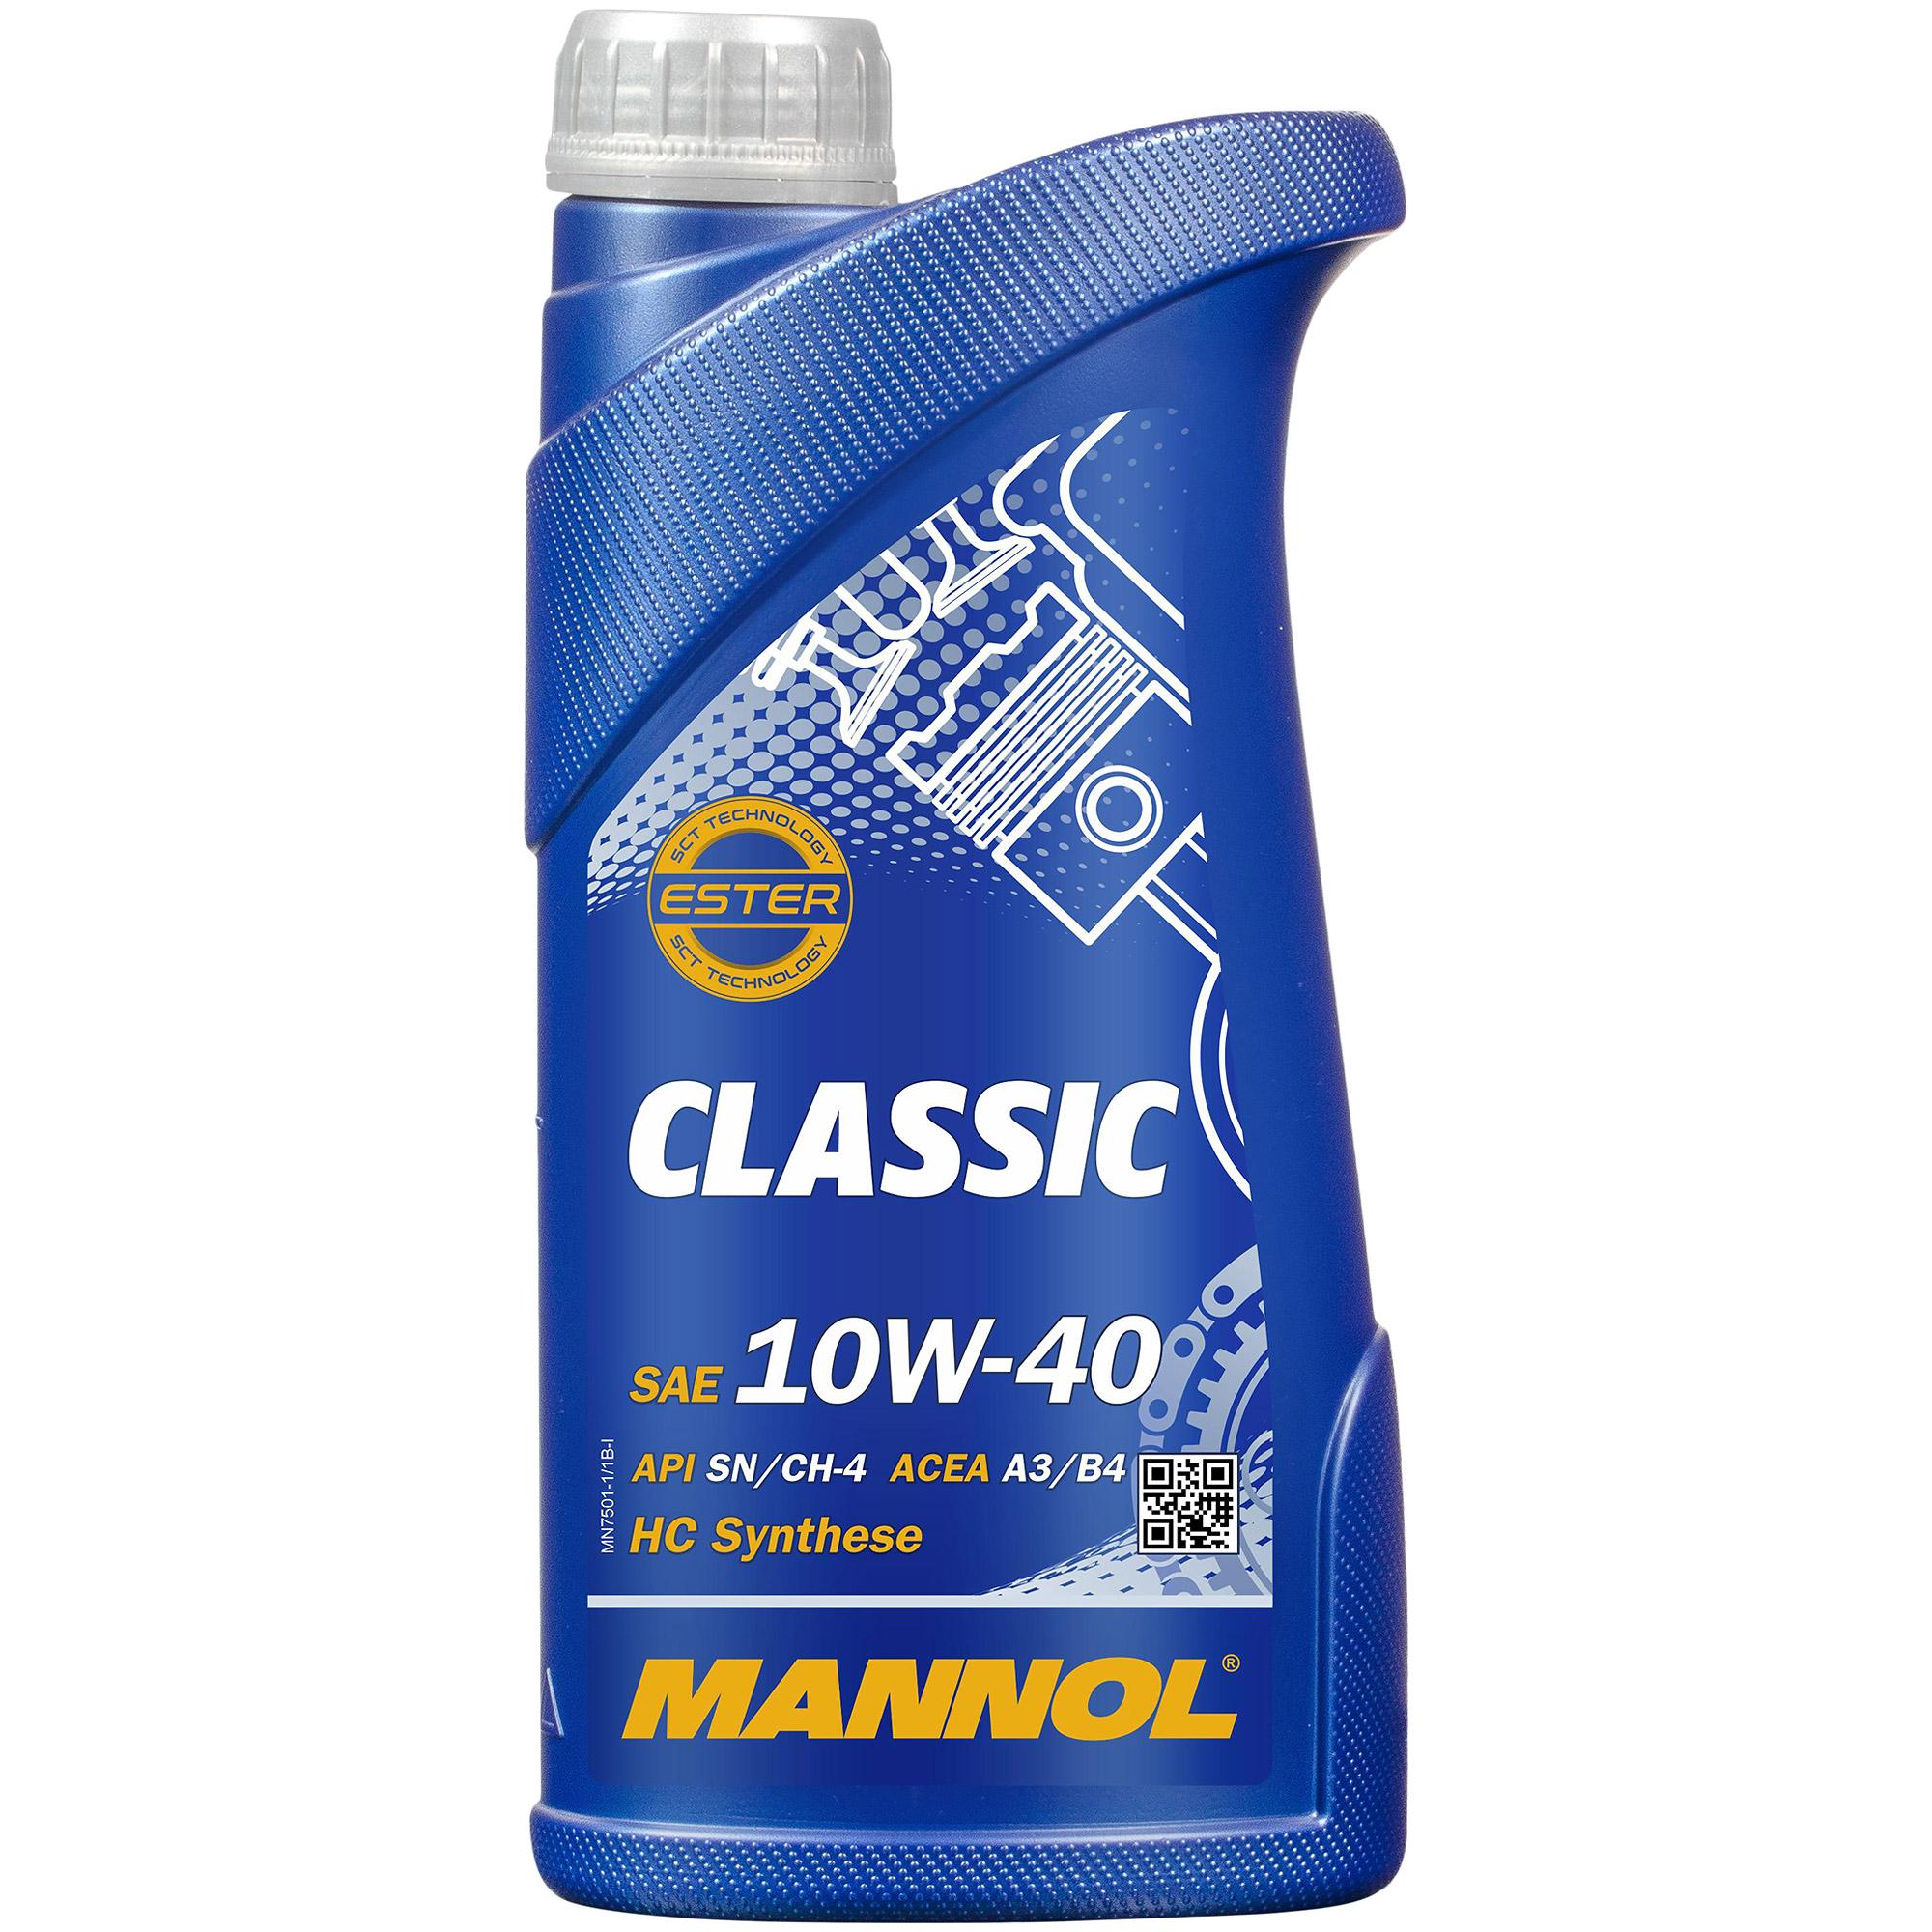 Motor-aceite-8l-MANNOL-Classic-10w-40-hombre-filtro-Filtro-paquete-Mercedes-Benz-CLK-c208 miniatura 2